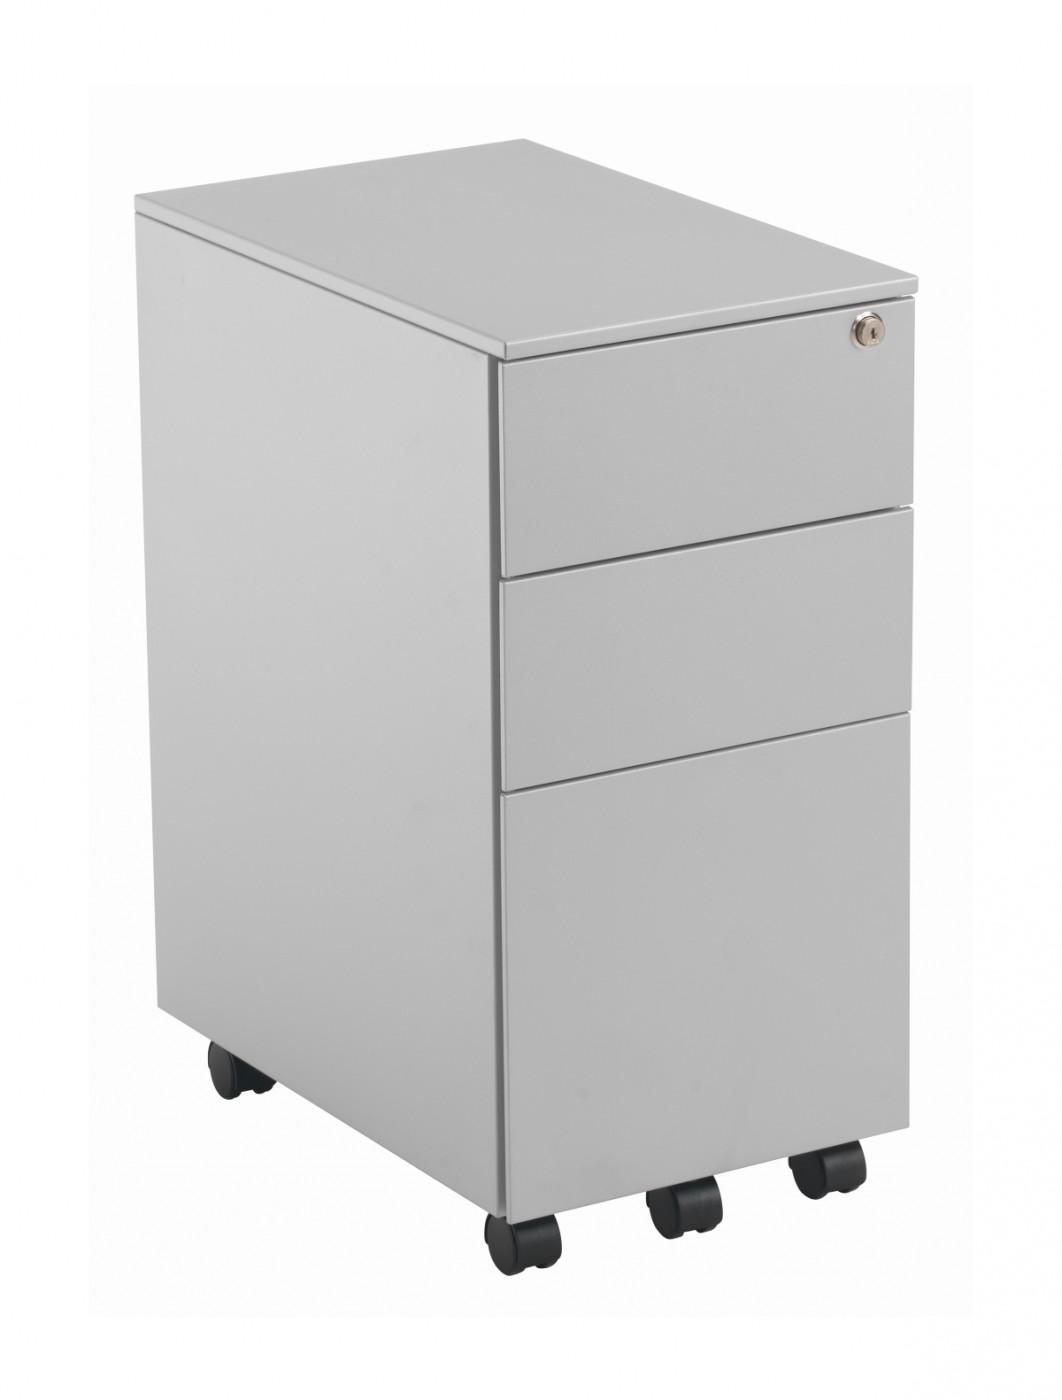 Office furniture mobile pedestal tkussmp3 office storage enlarged view